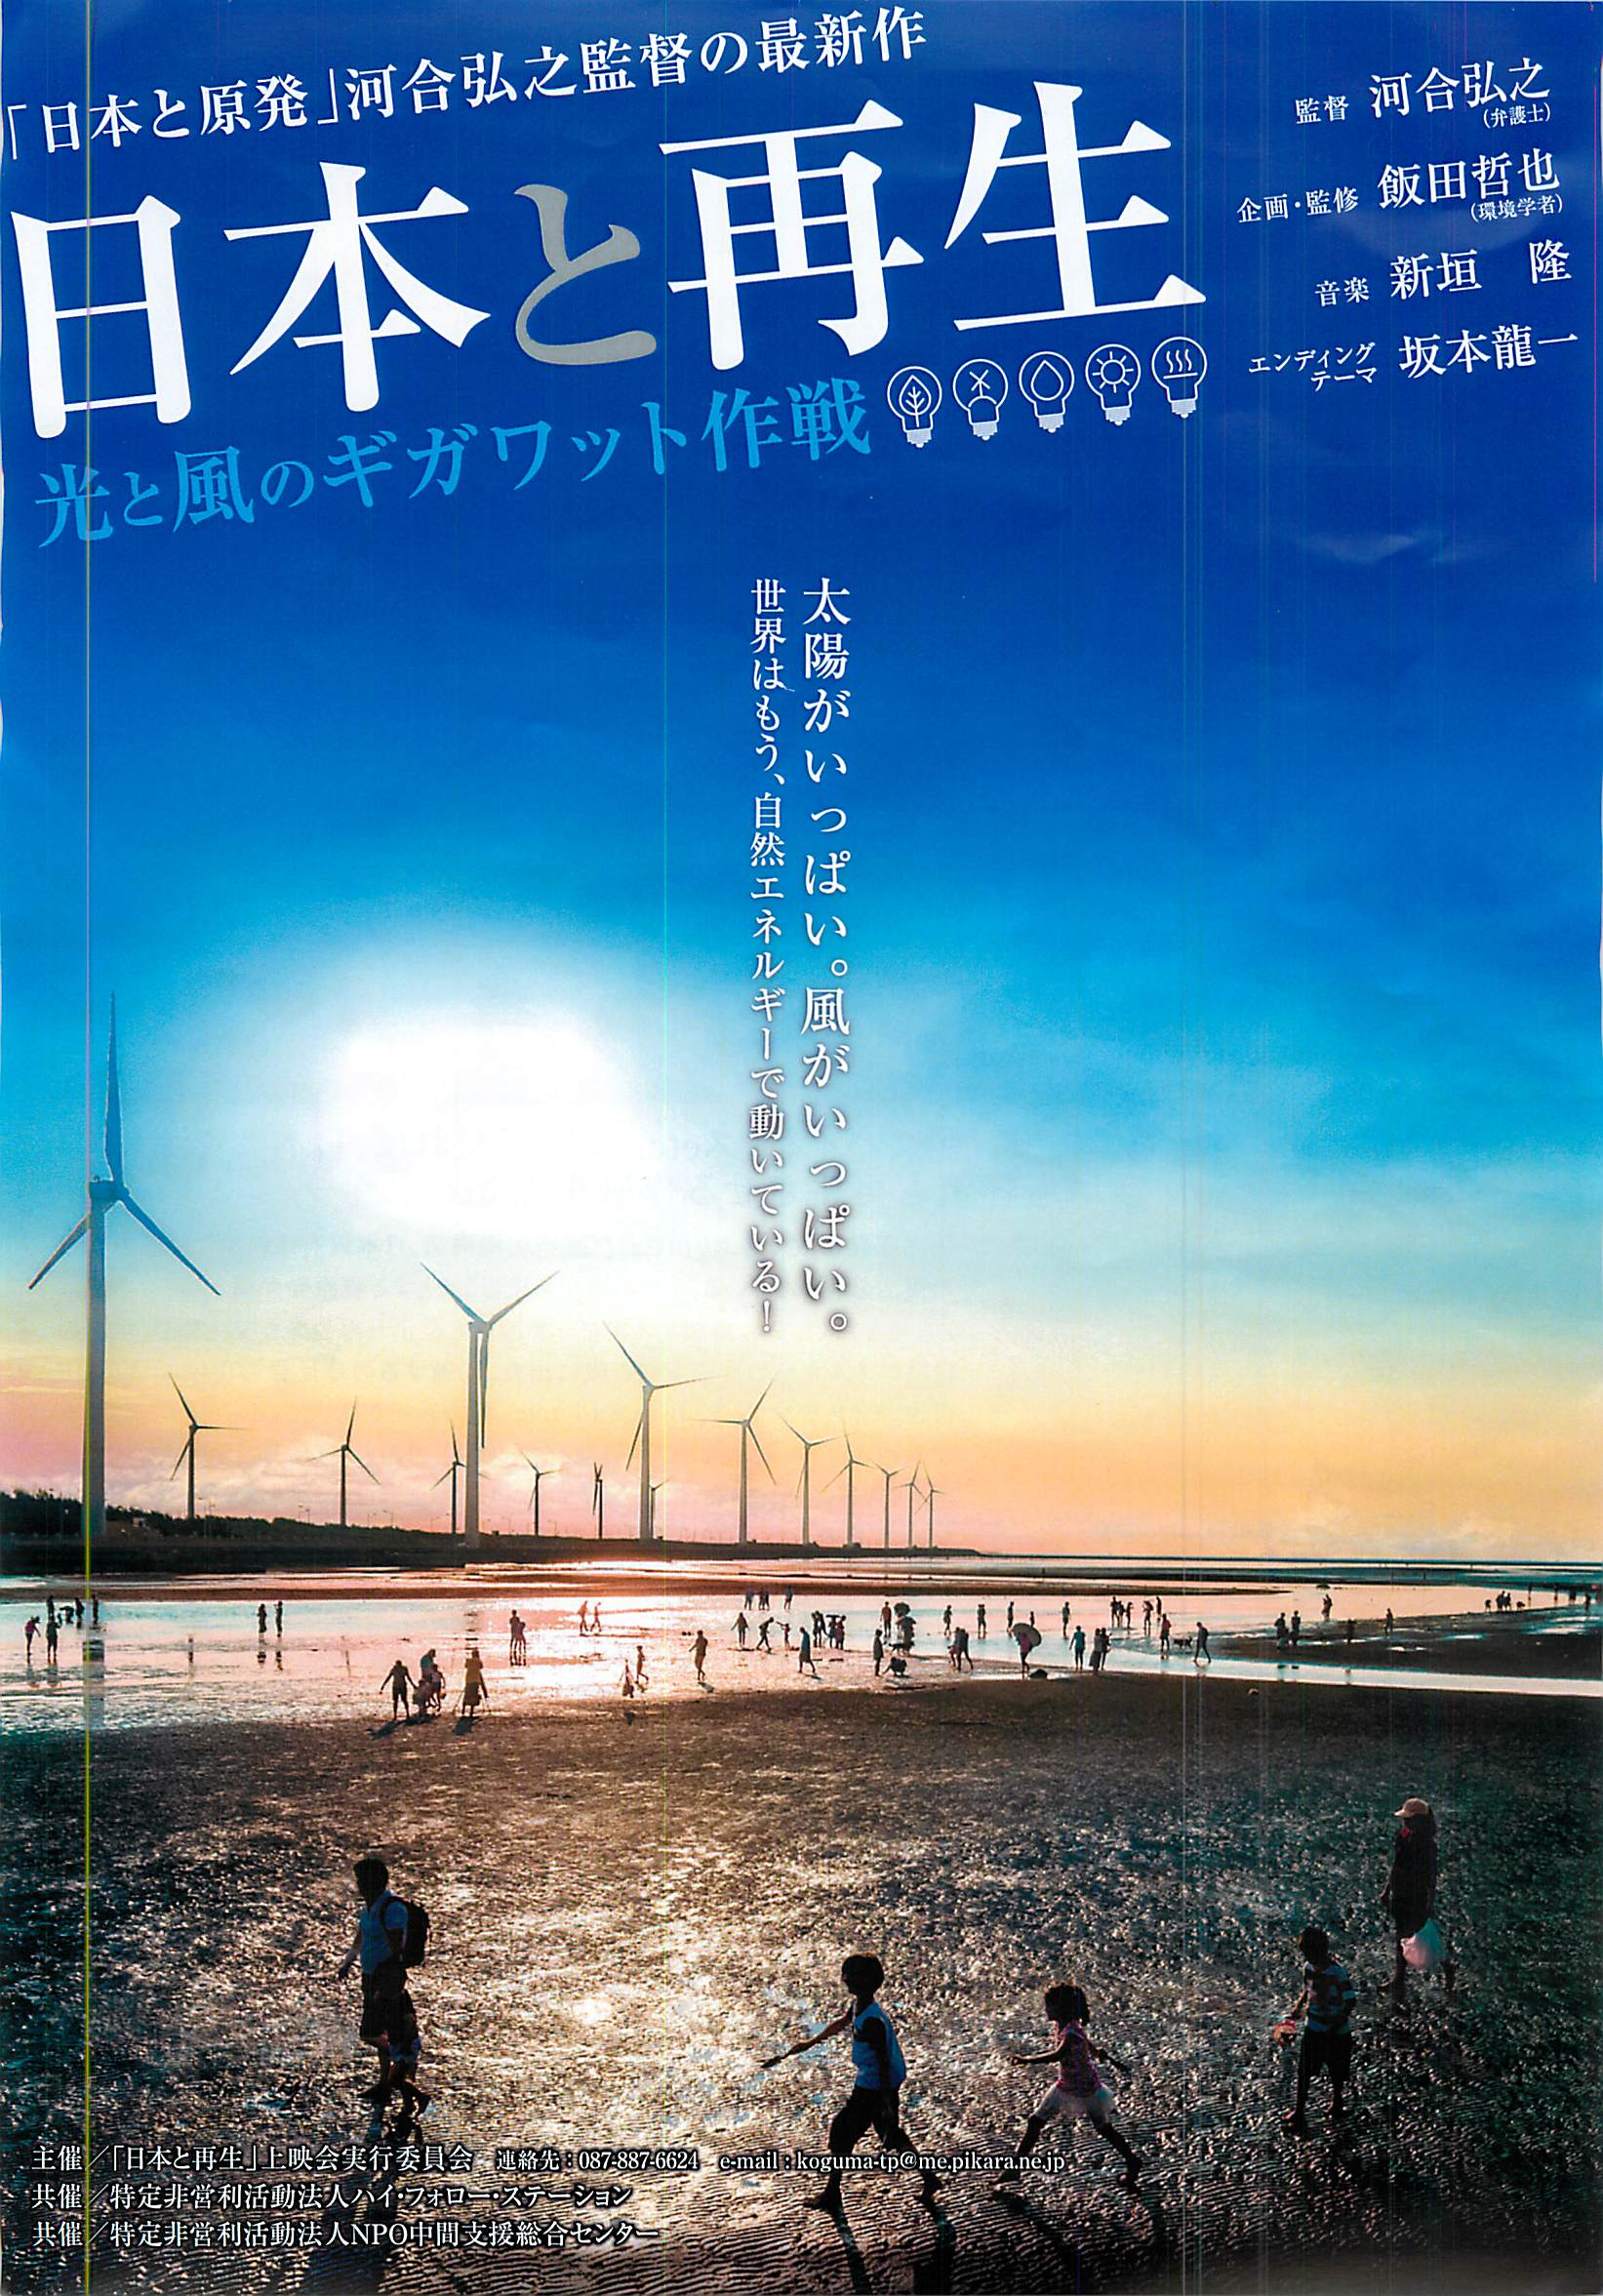 http://umimori-sanuki.com/wp-content/uploads/2018/04/eb1aff50dd12e9a249e054a2d9f1090b.jpg